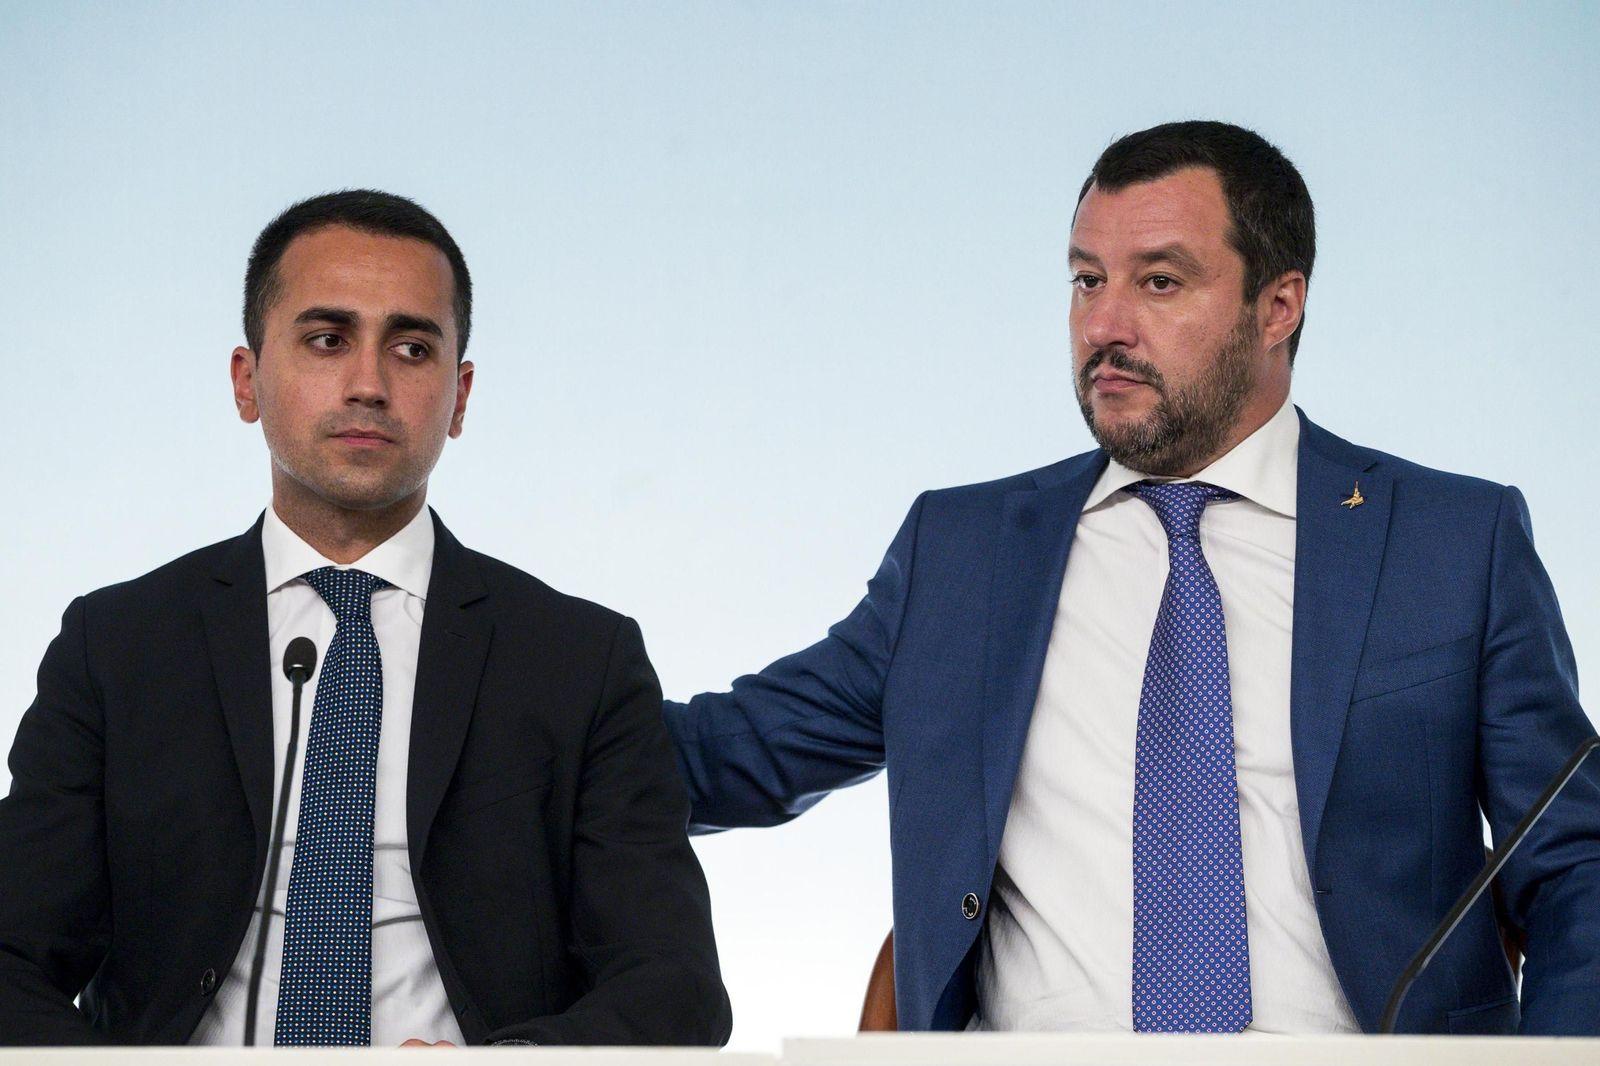 Italien ändert umstrittene Haushaltspläne